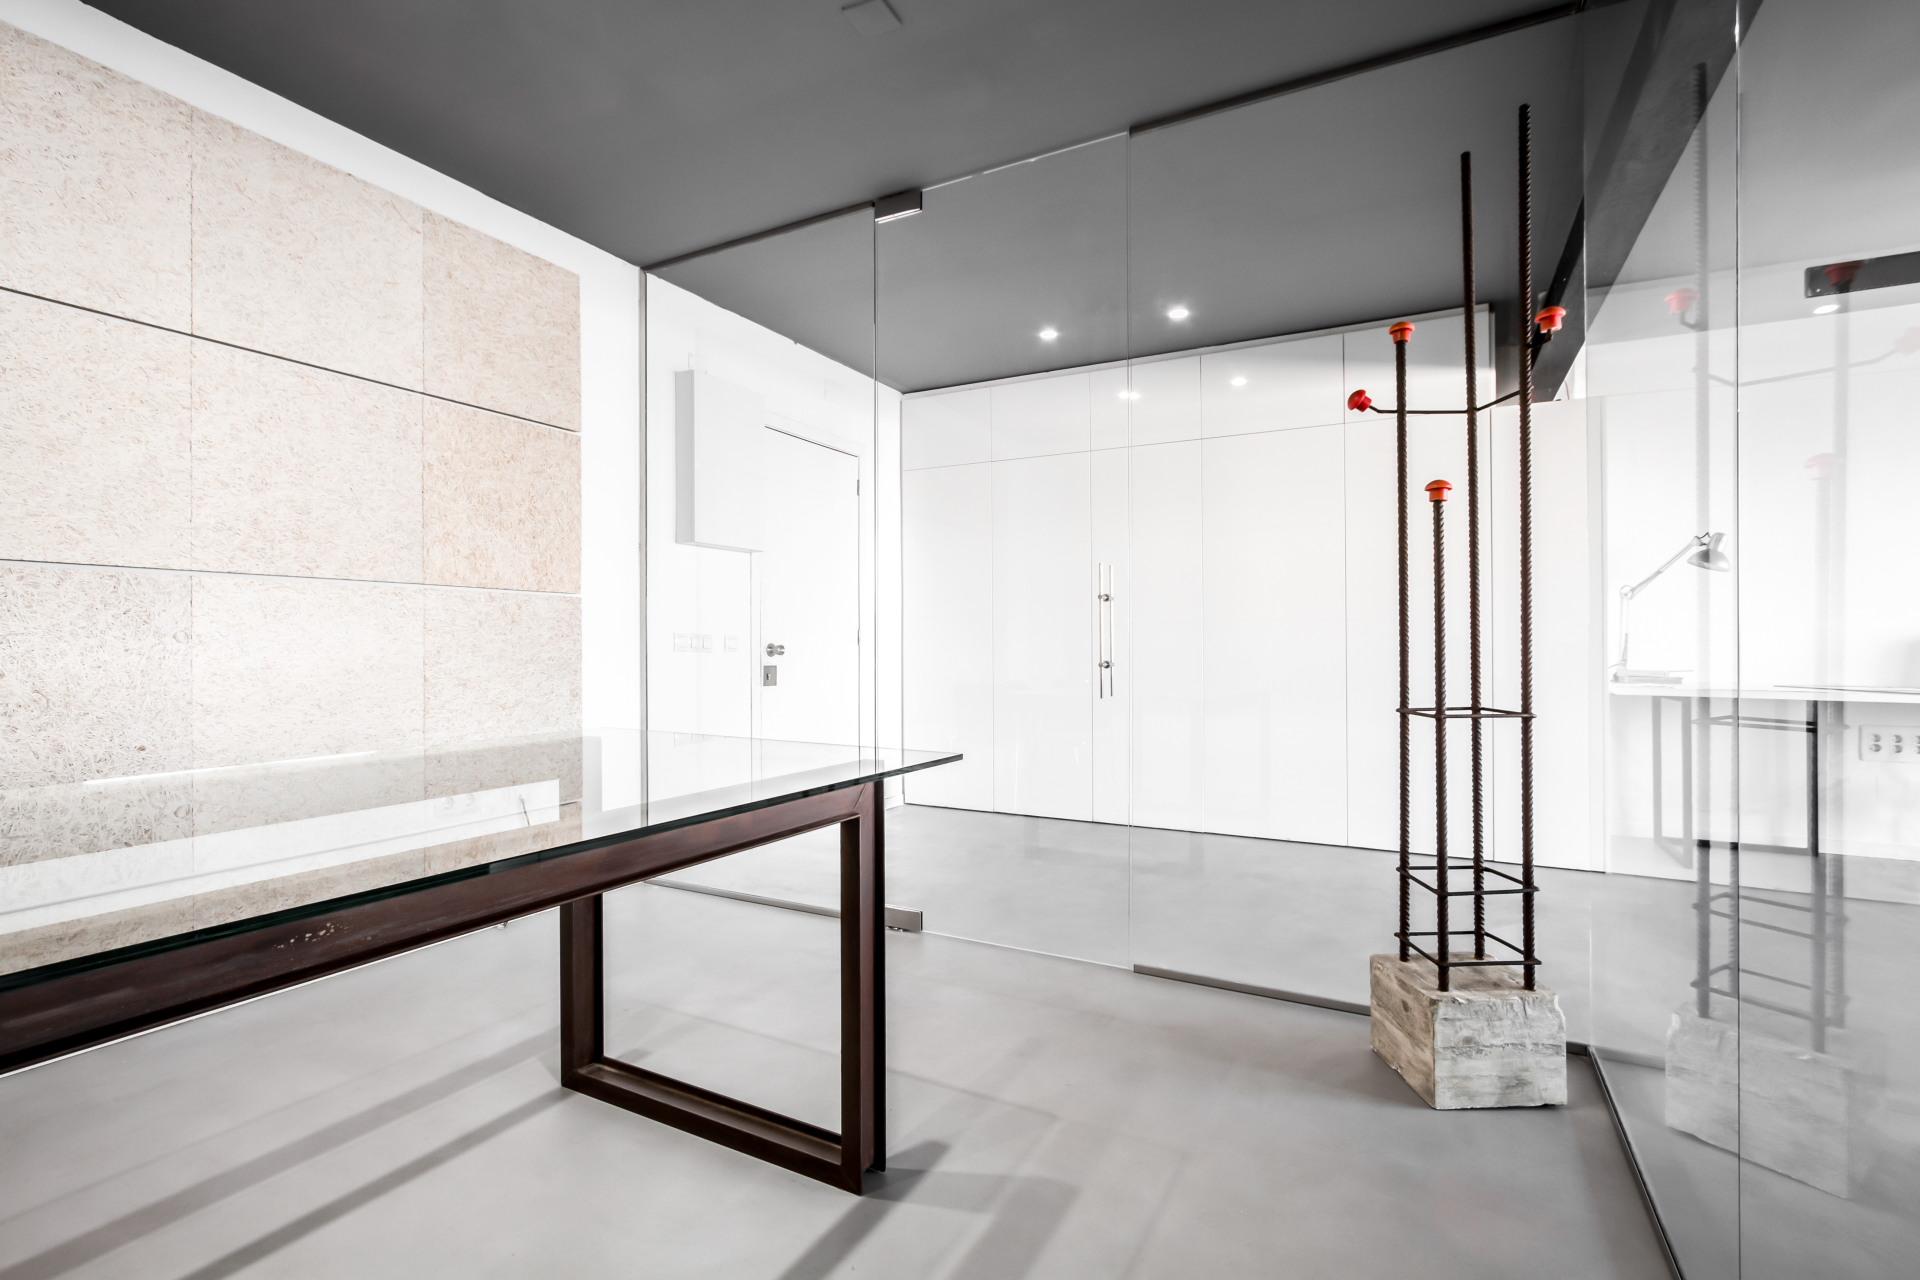 fotografia-arquitectura-valencia-german-cabo-viraje-estudio (9)